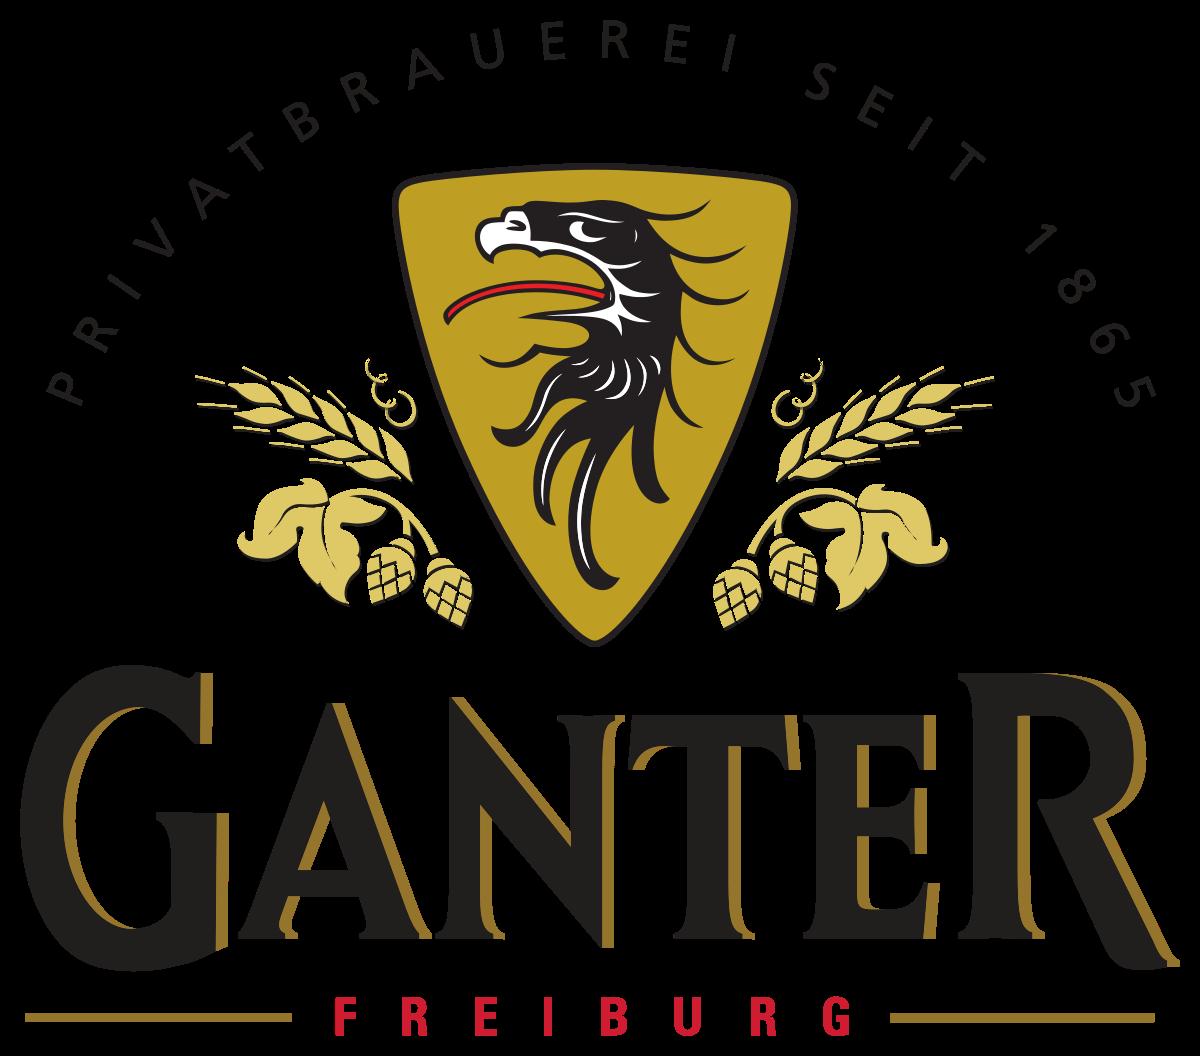 Logo Brauerei Ganter GmbH & Co. KG